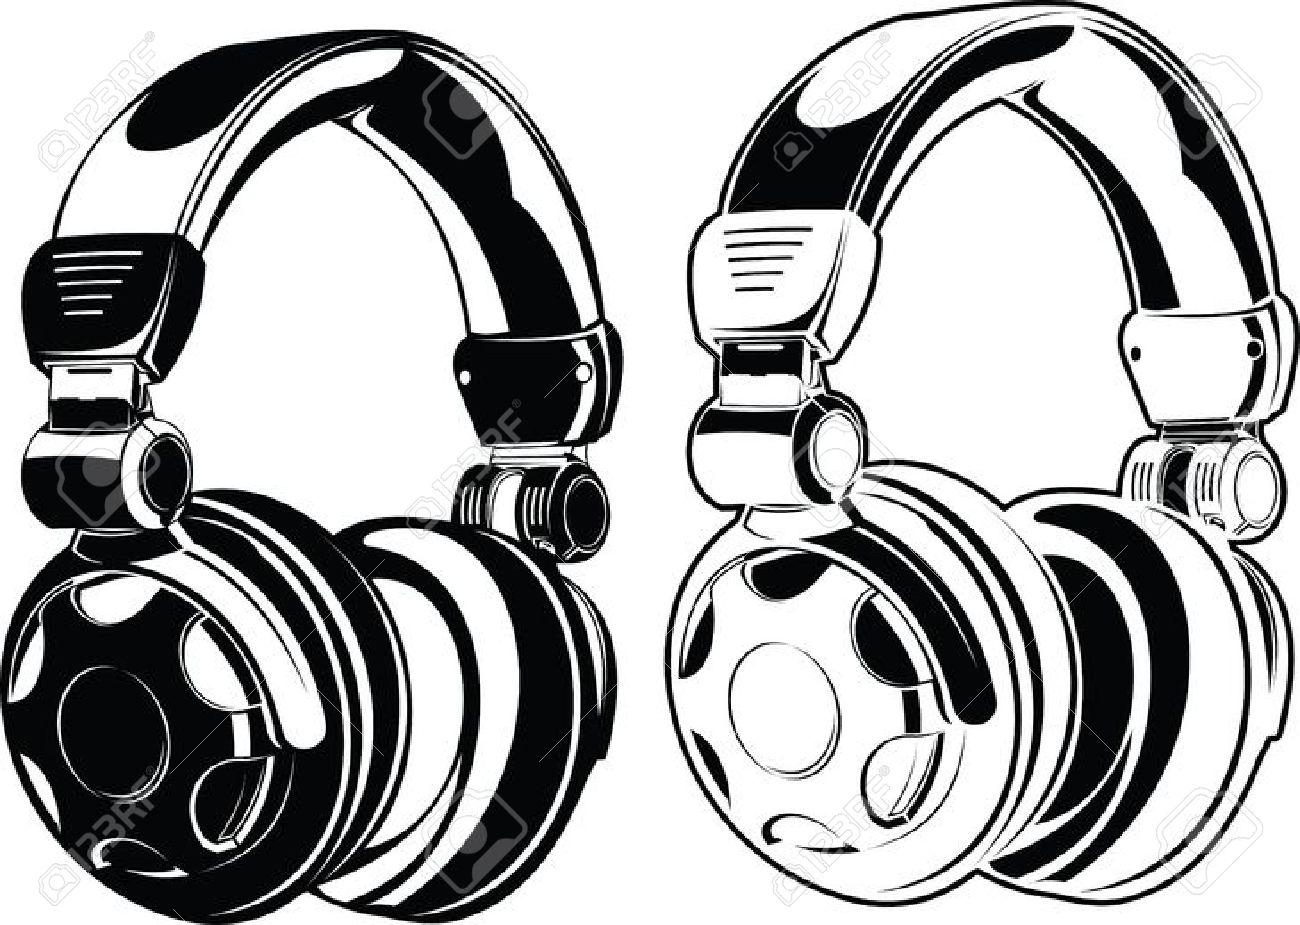 1300x925 Drawn Speakers Beats Headphone 3446455